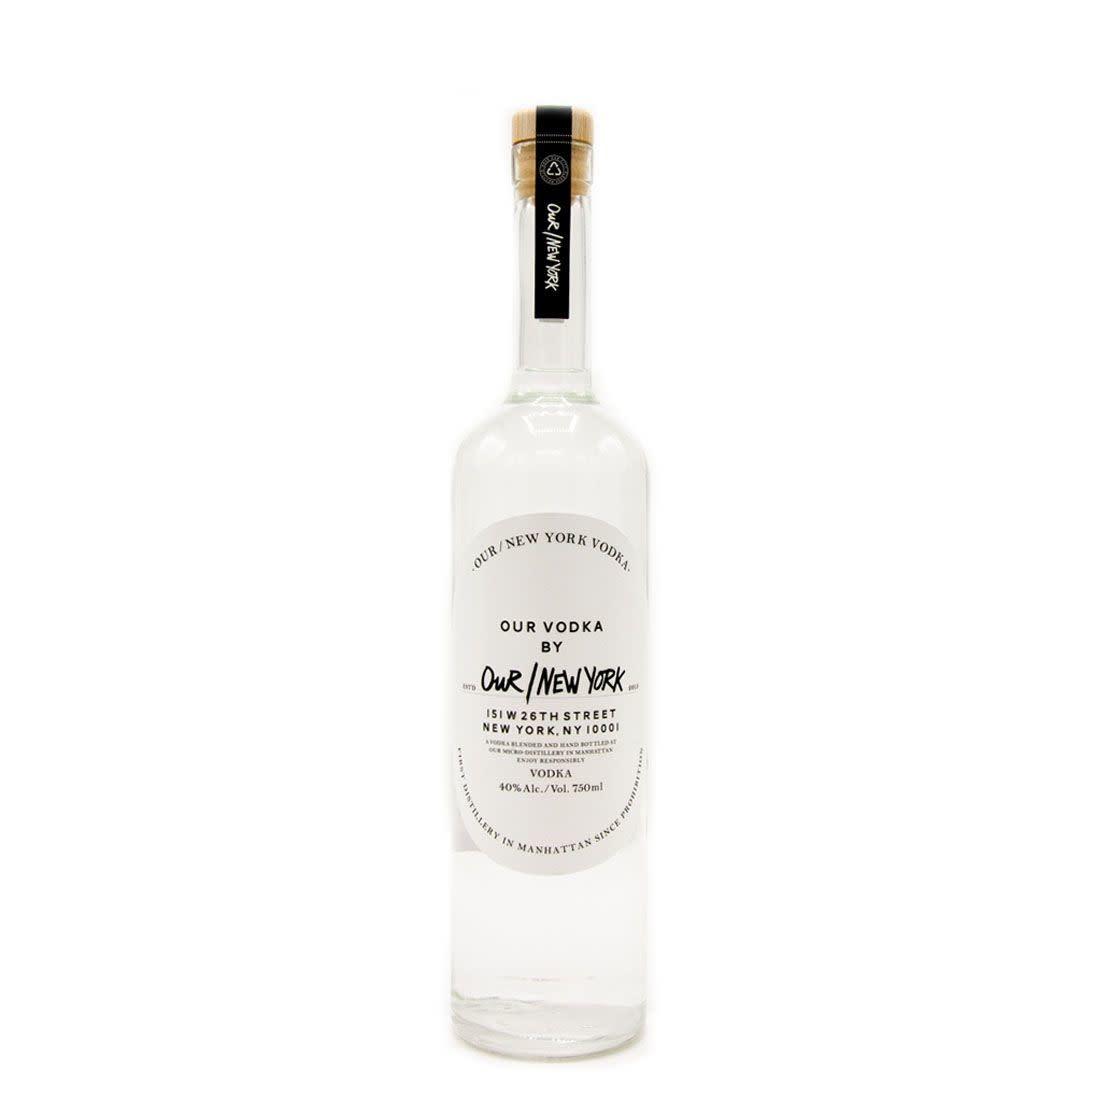 USA Our New York Vodka 750ml